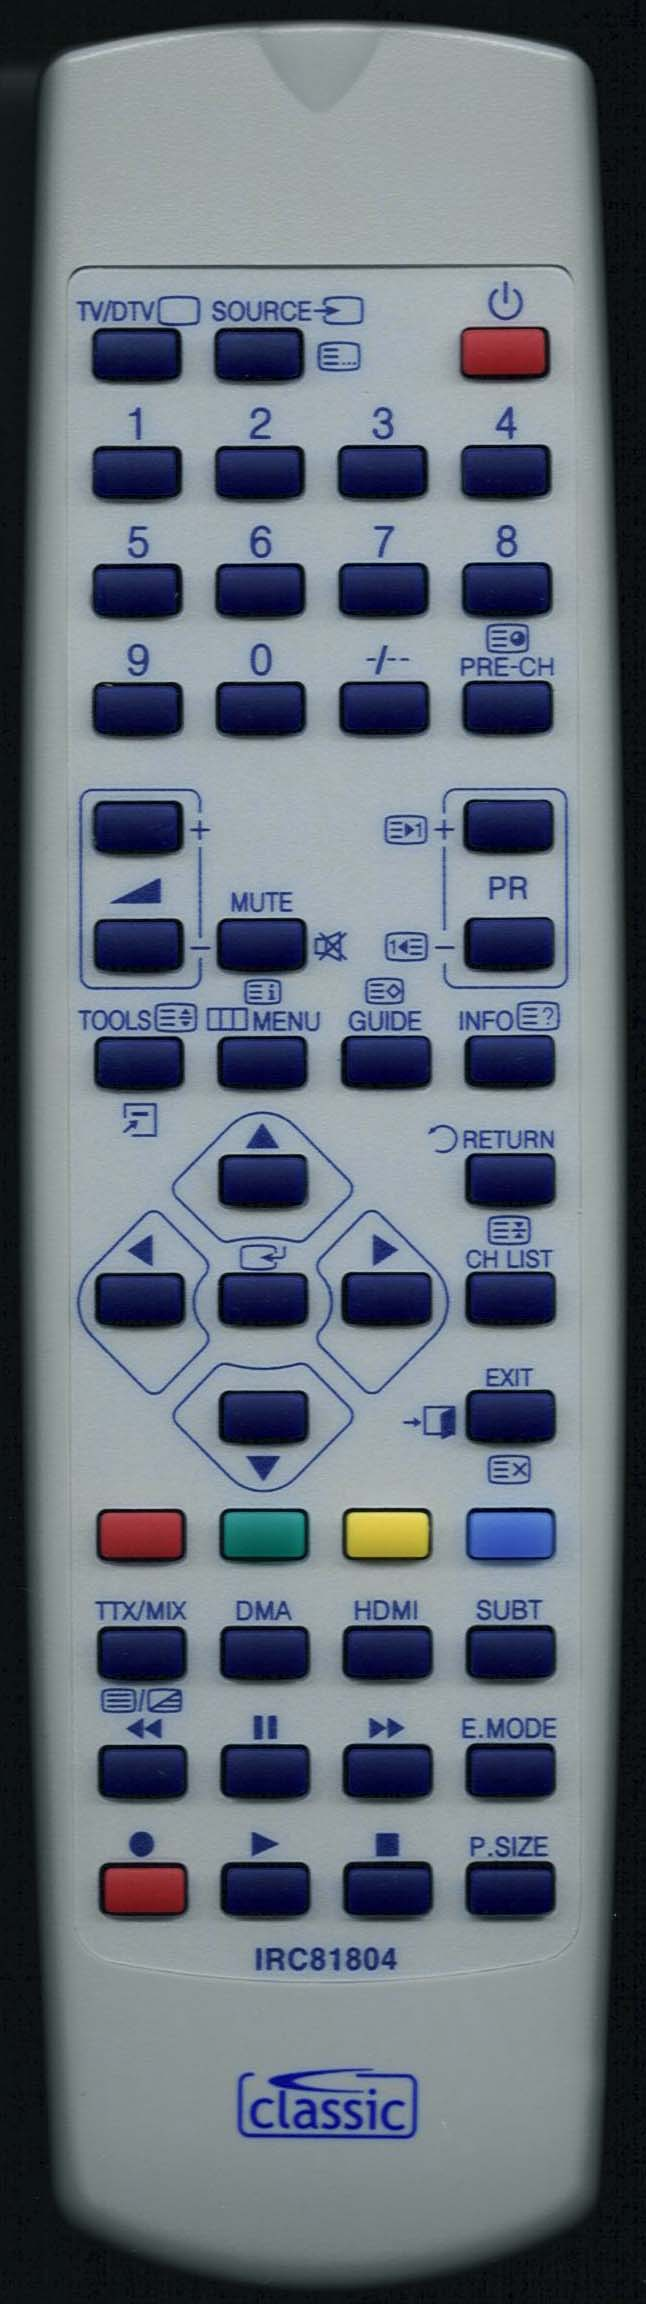 SAMSUNG LE26A457C1D Remote Control Alternative